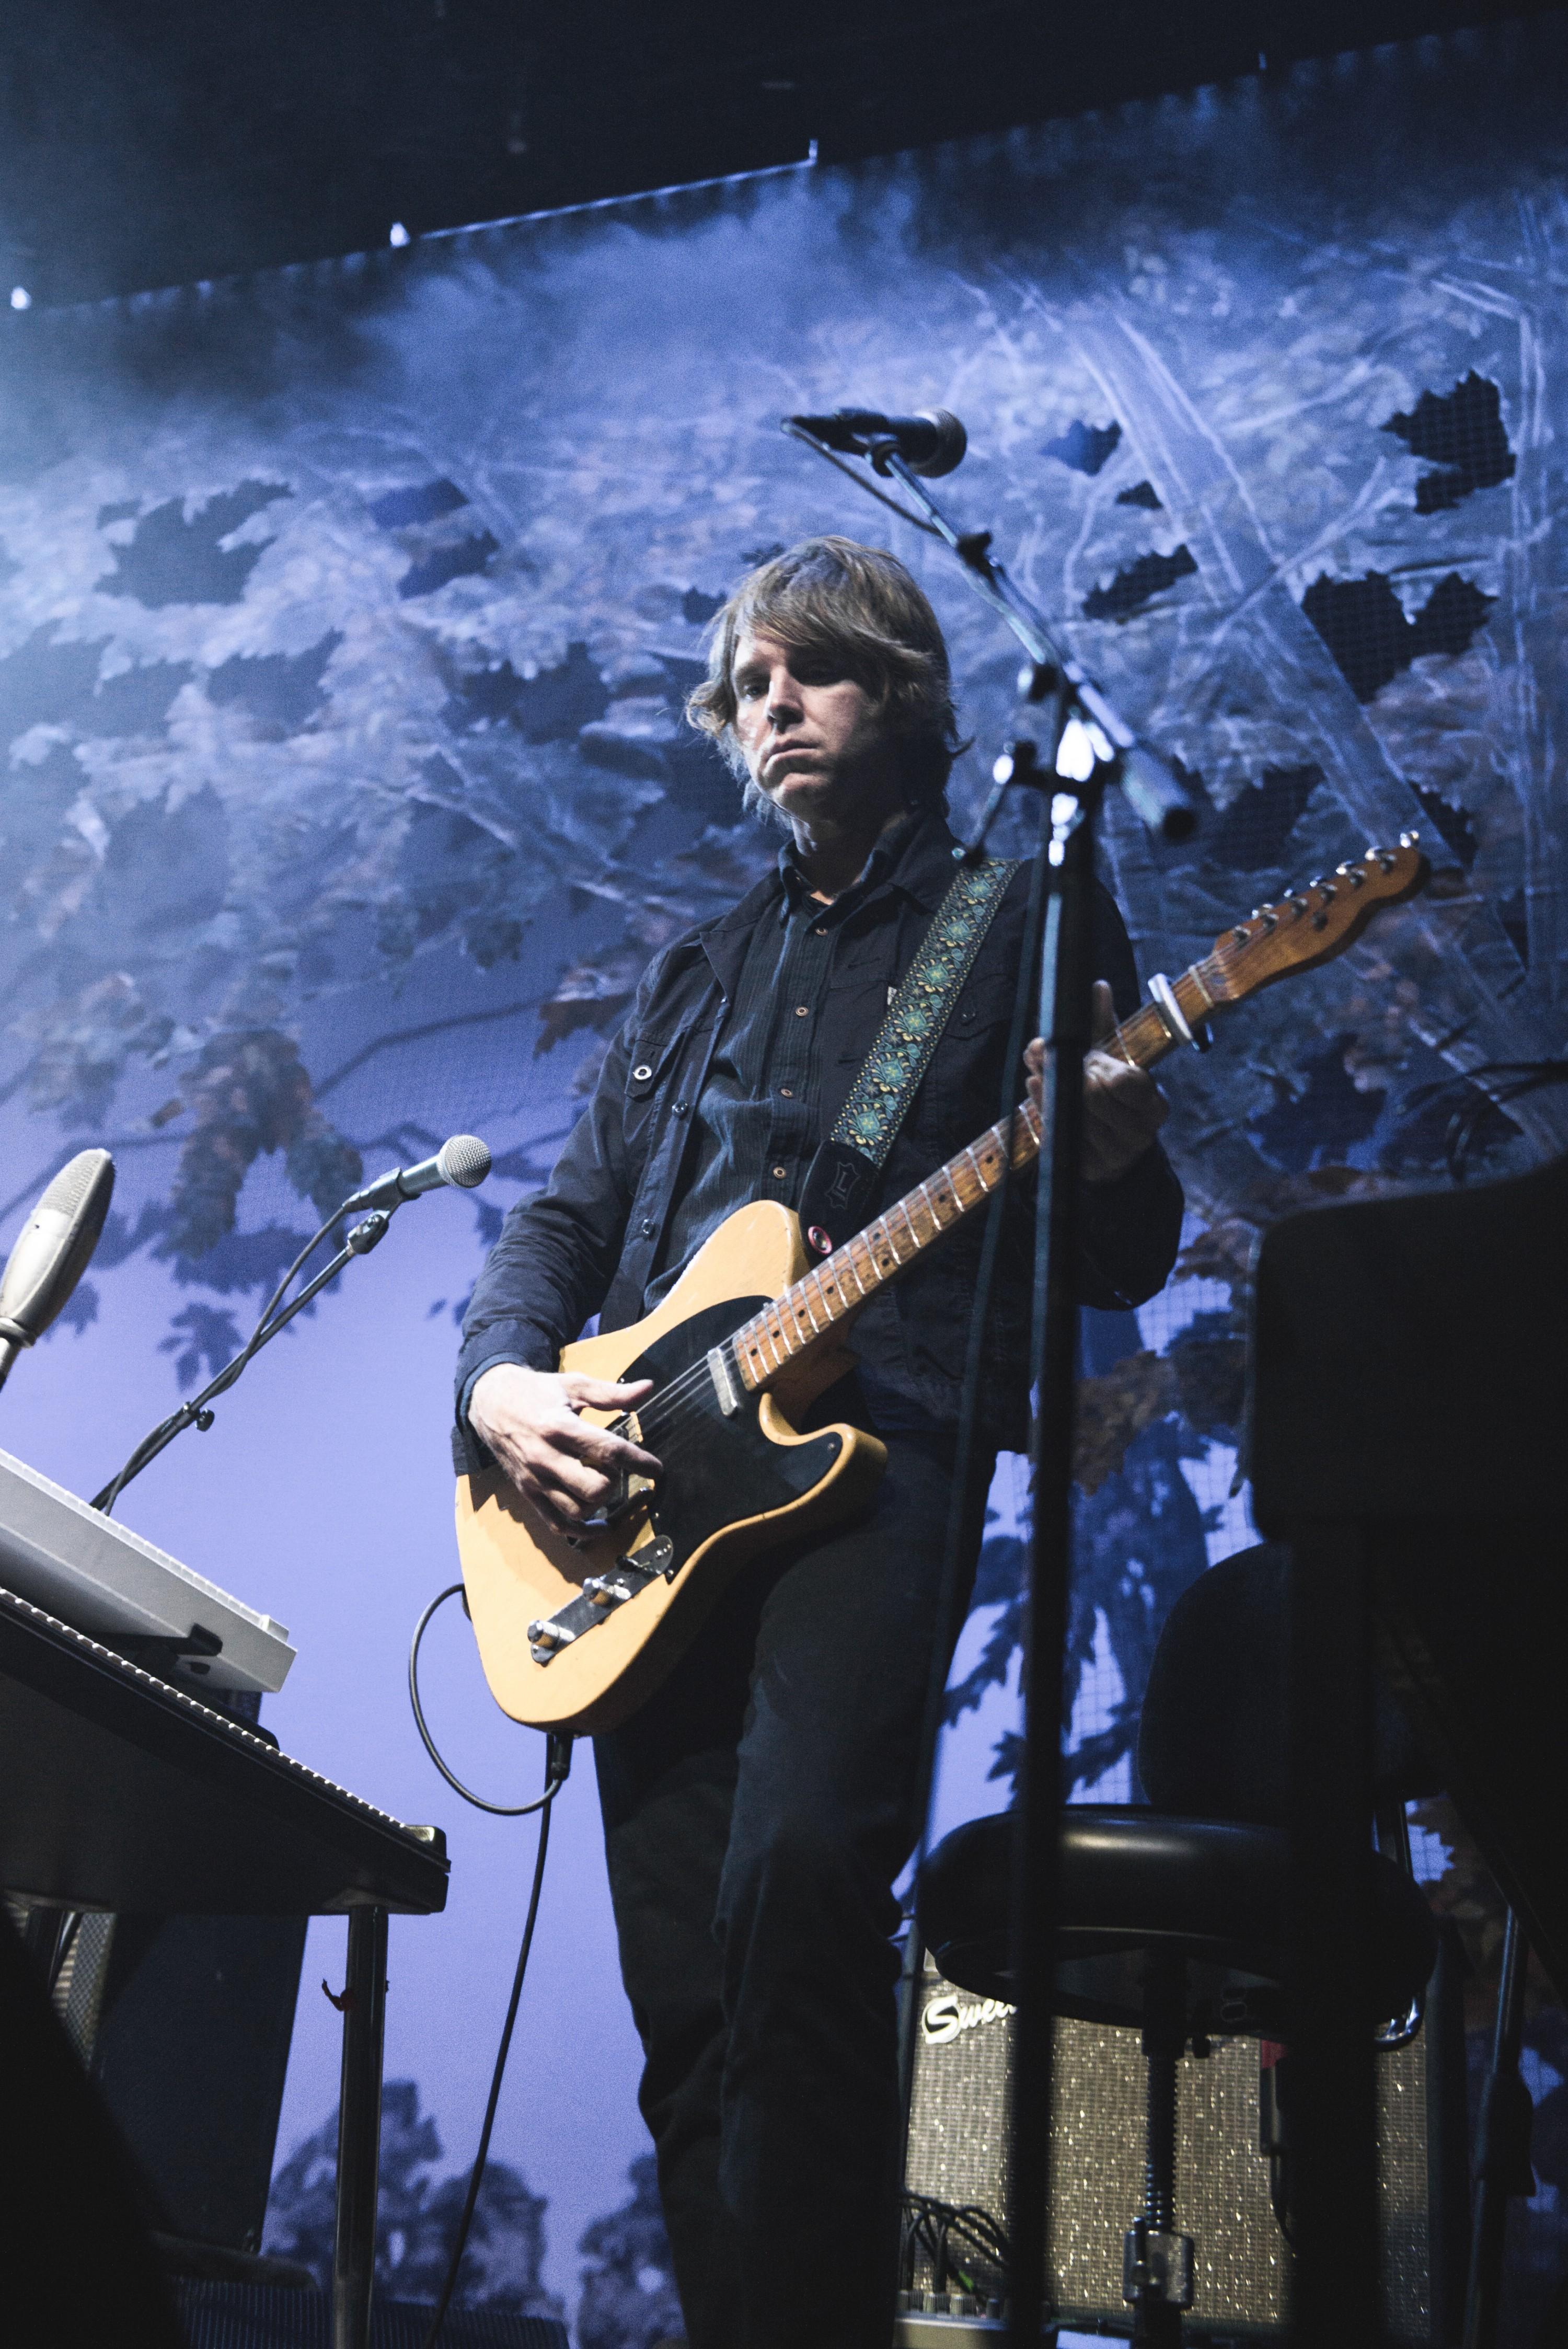 Wilco Enters A Quieter More Downbeat Era At The Schnitz